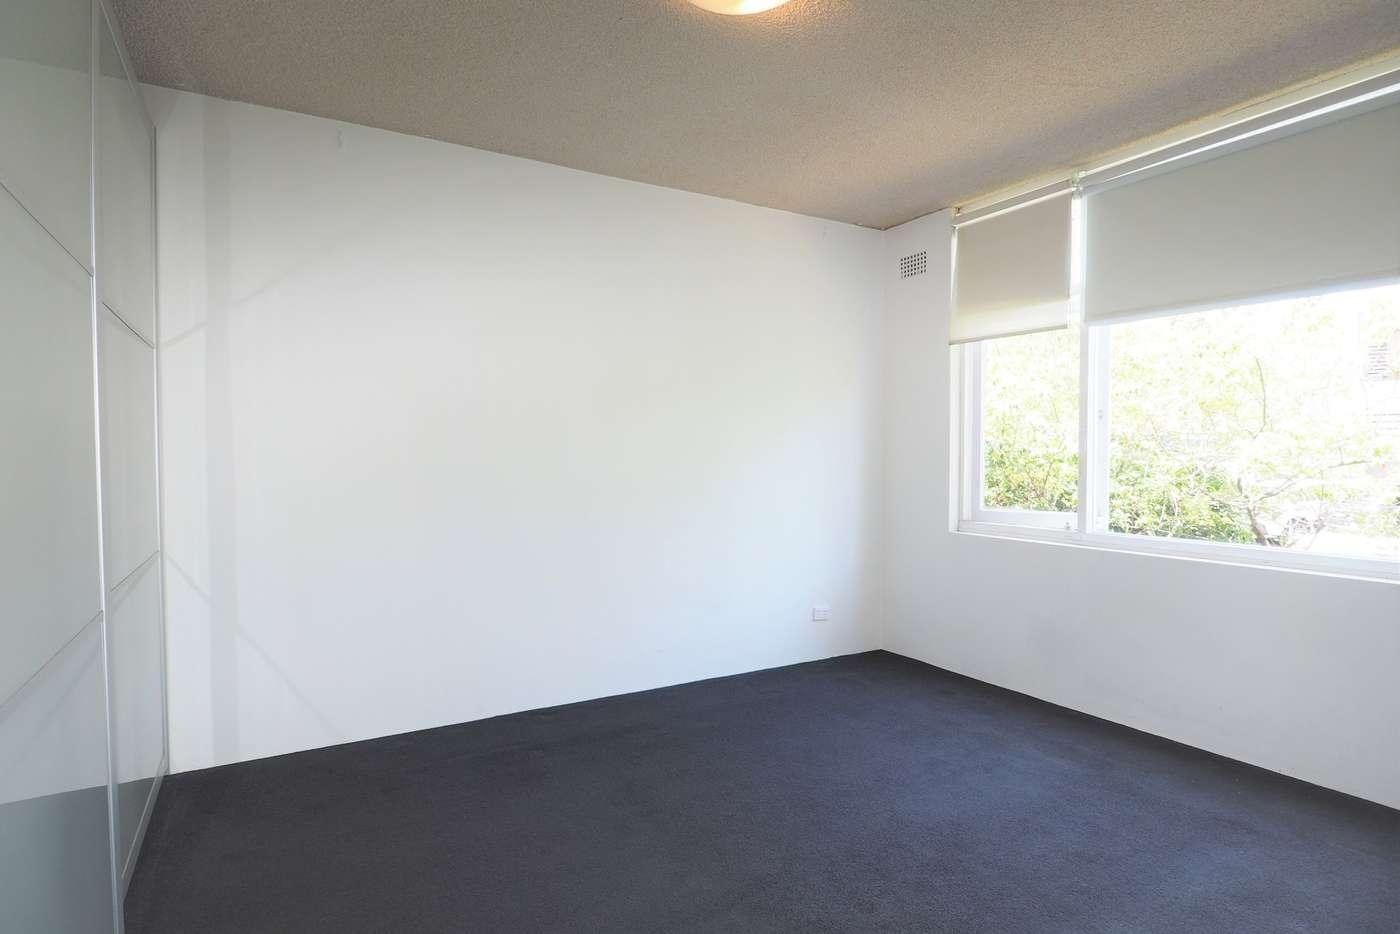 Sixth view of Homely apartment listing, 3/186 Raglan Street, Mosman NSW 2088